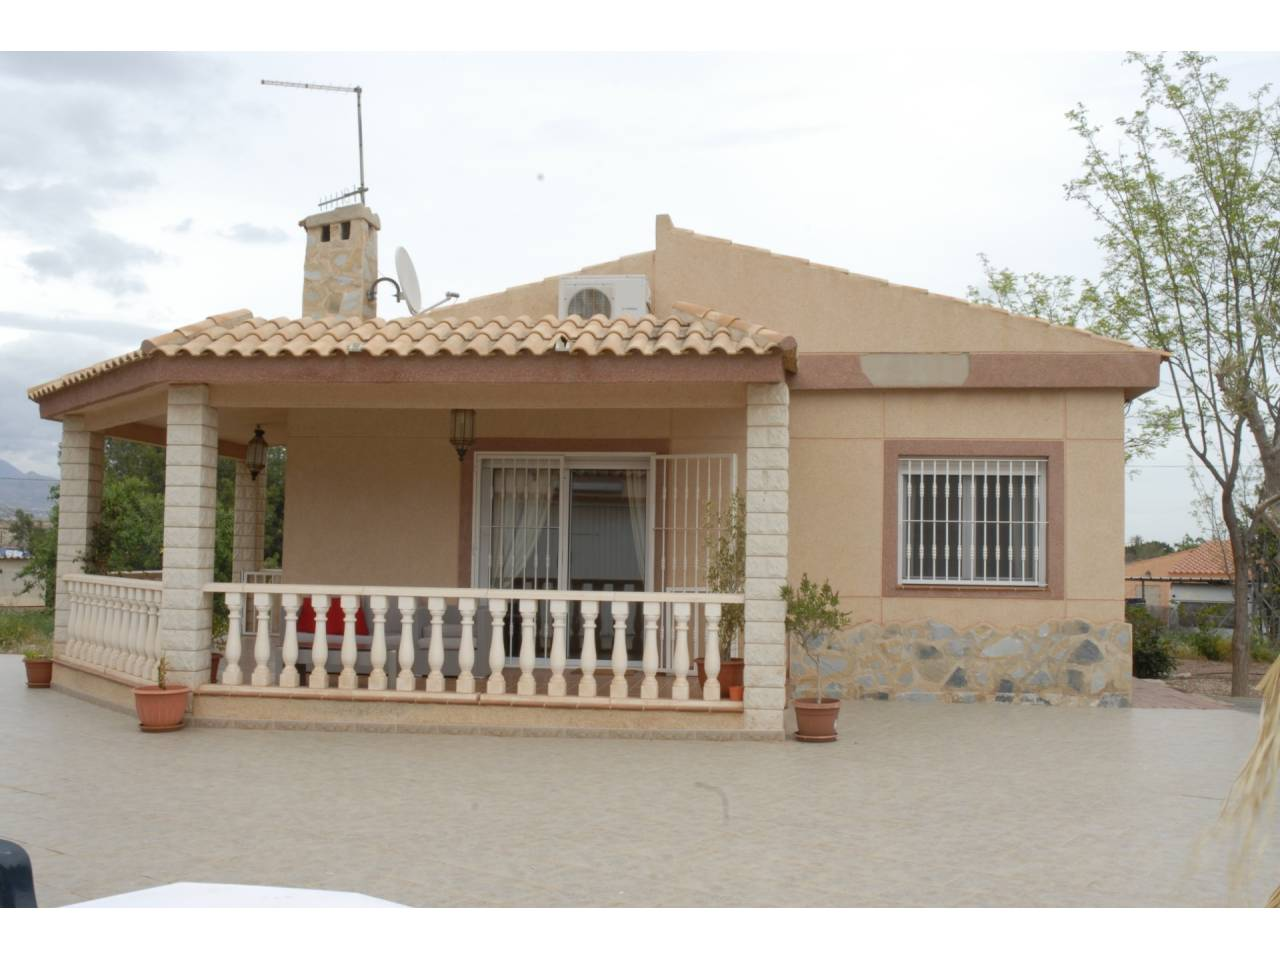 House in Cañada del Fenollar